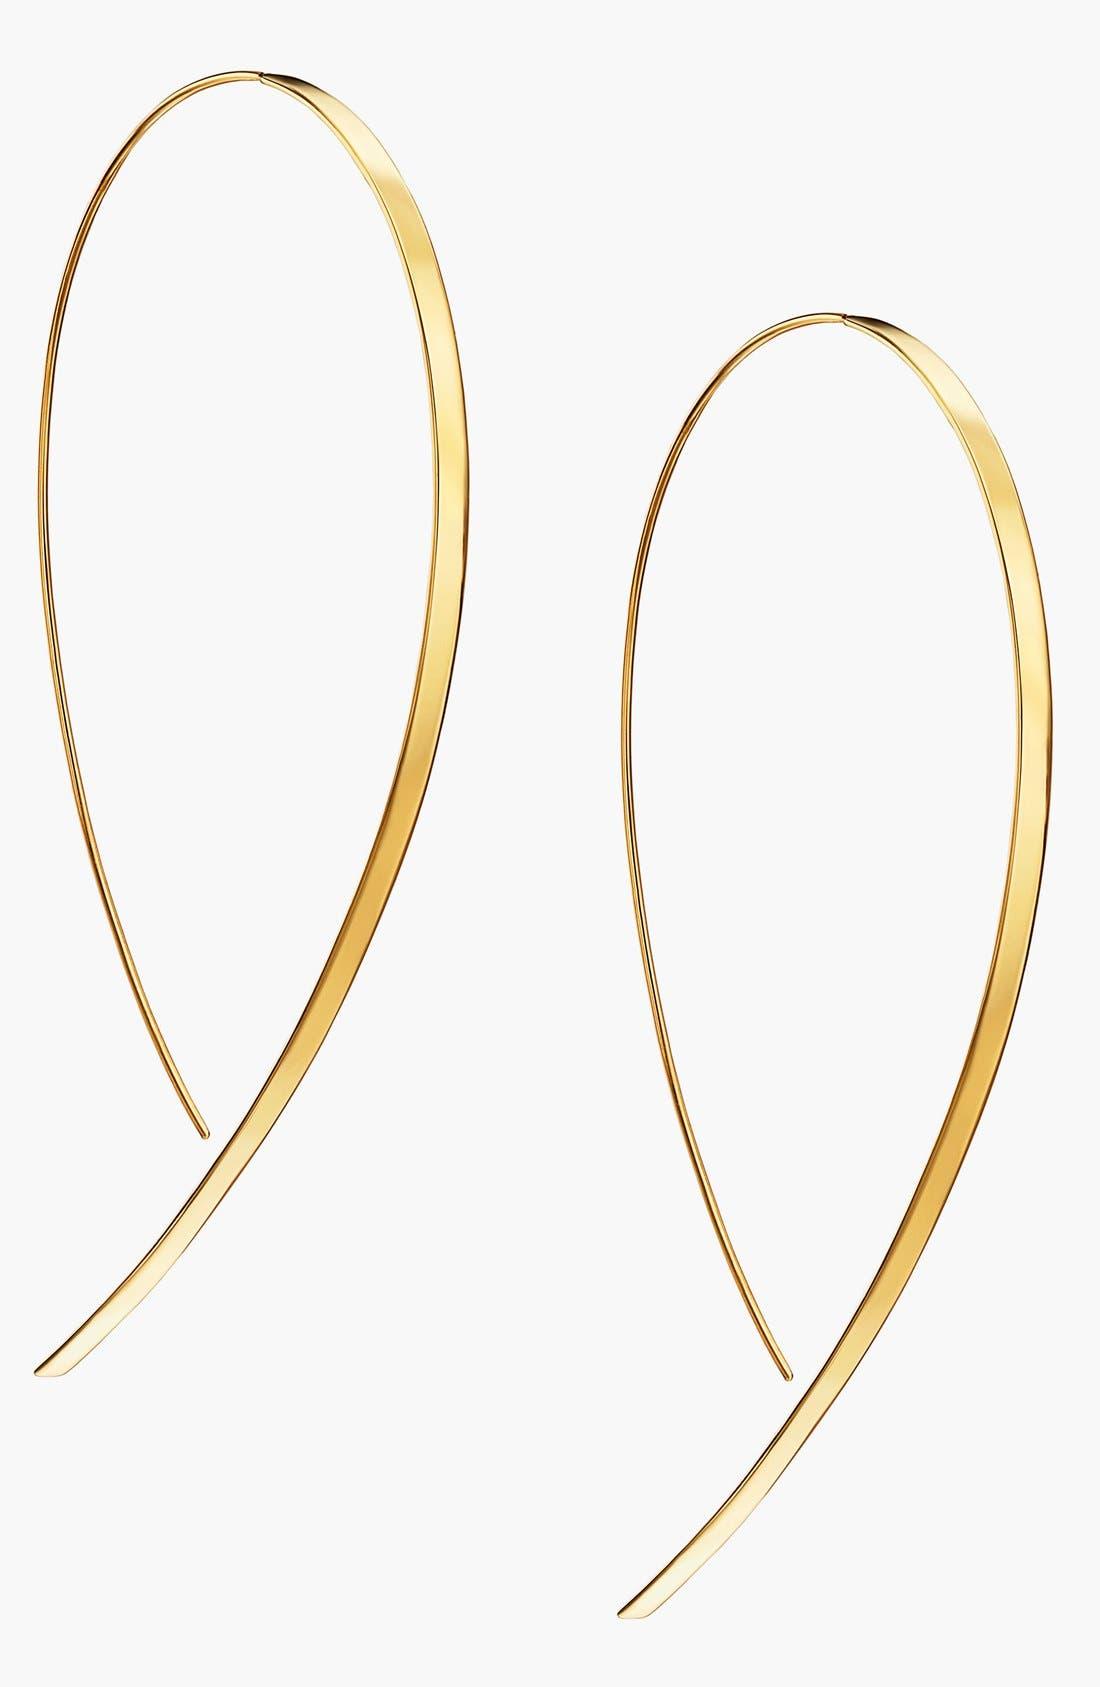 Main Image - Lana Jewelry 'Hooked On Hoop' Large Flat Earrings